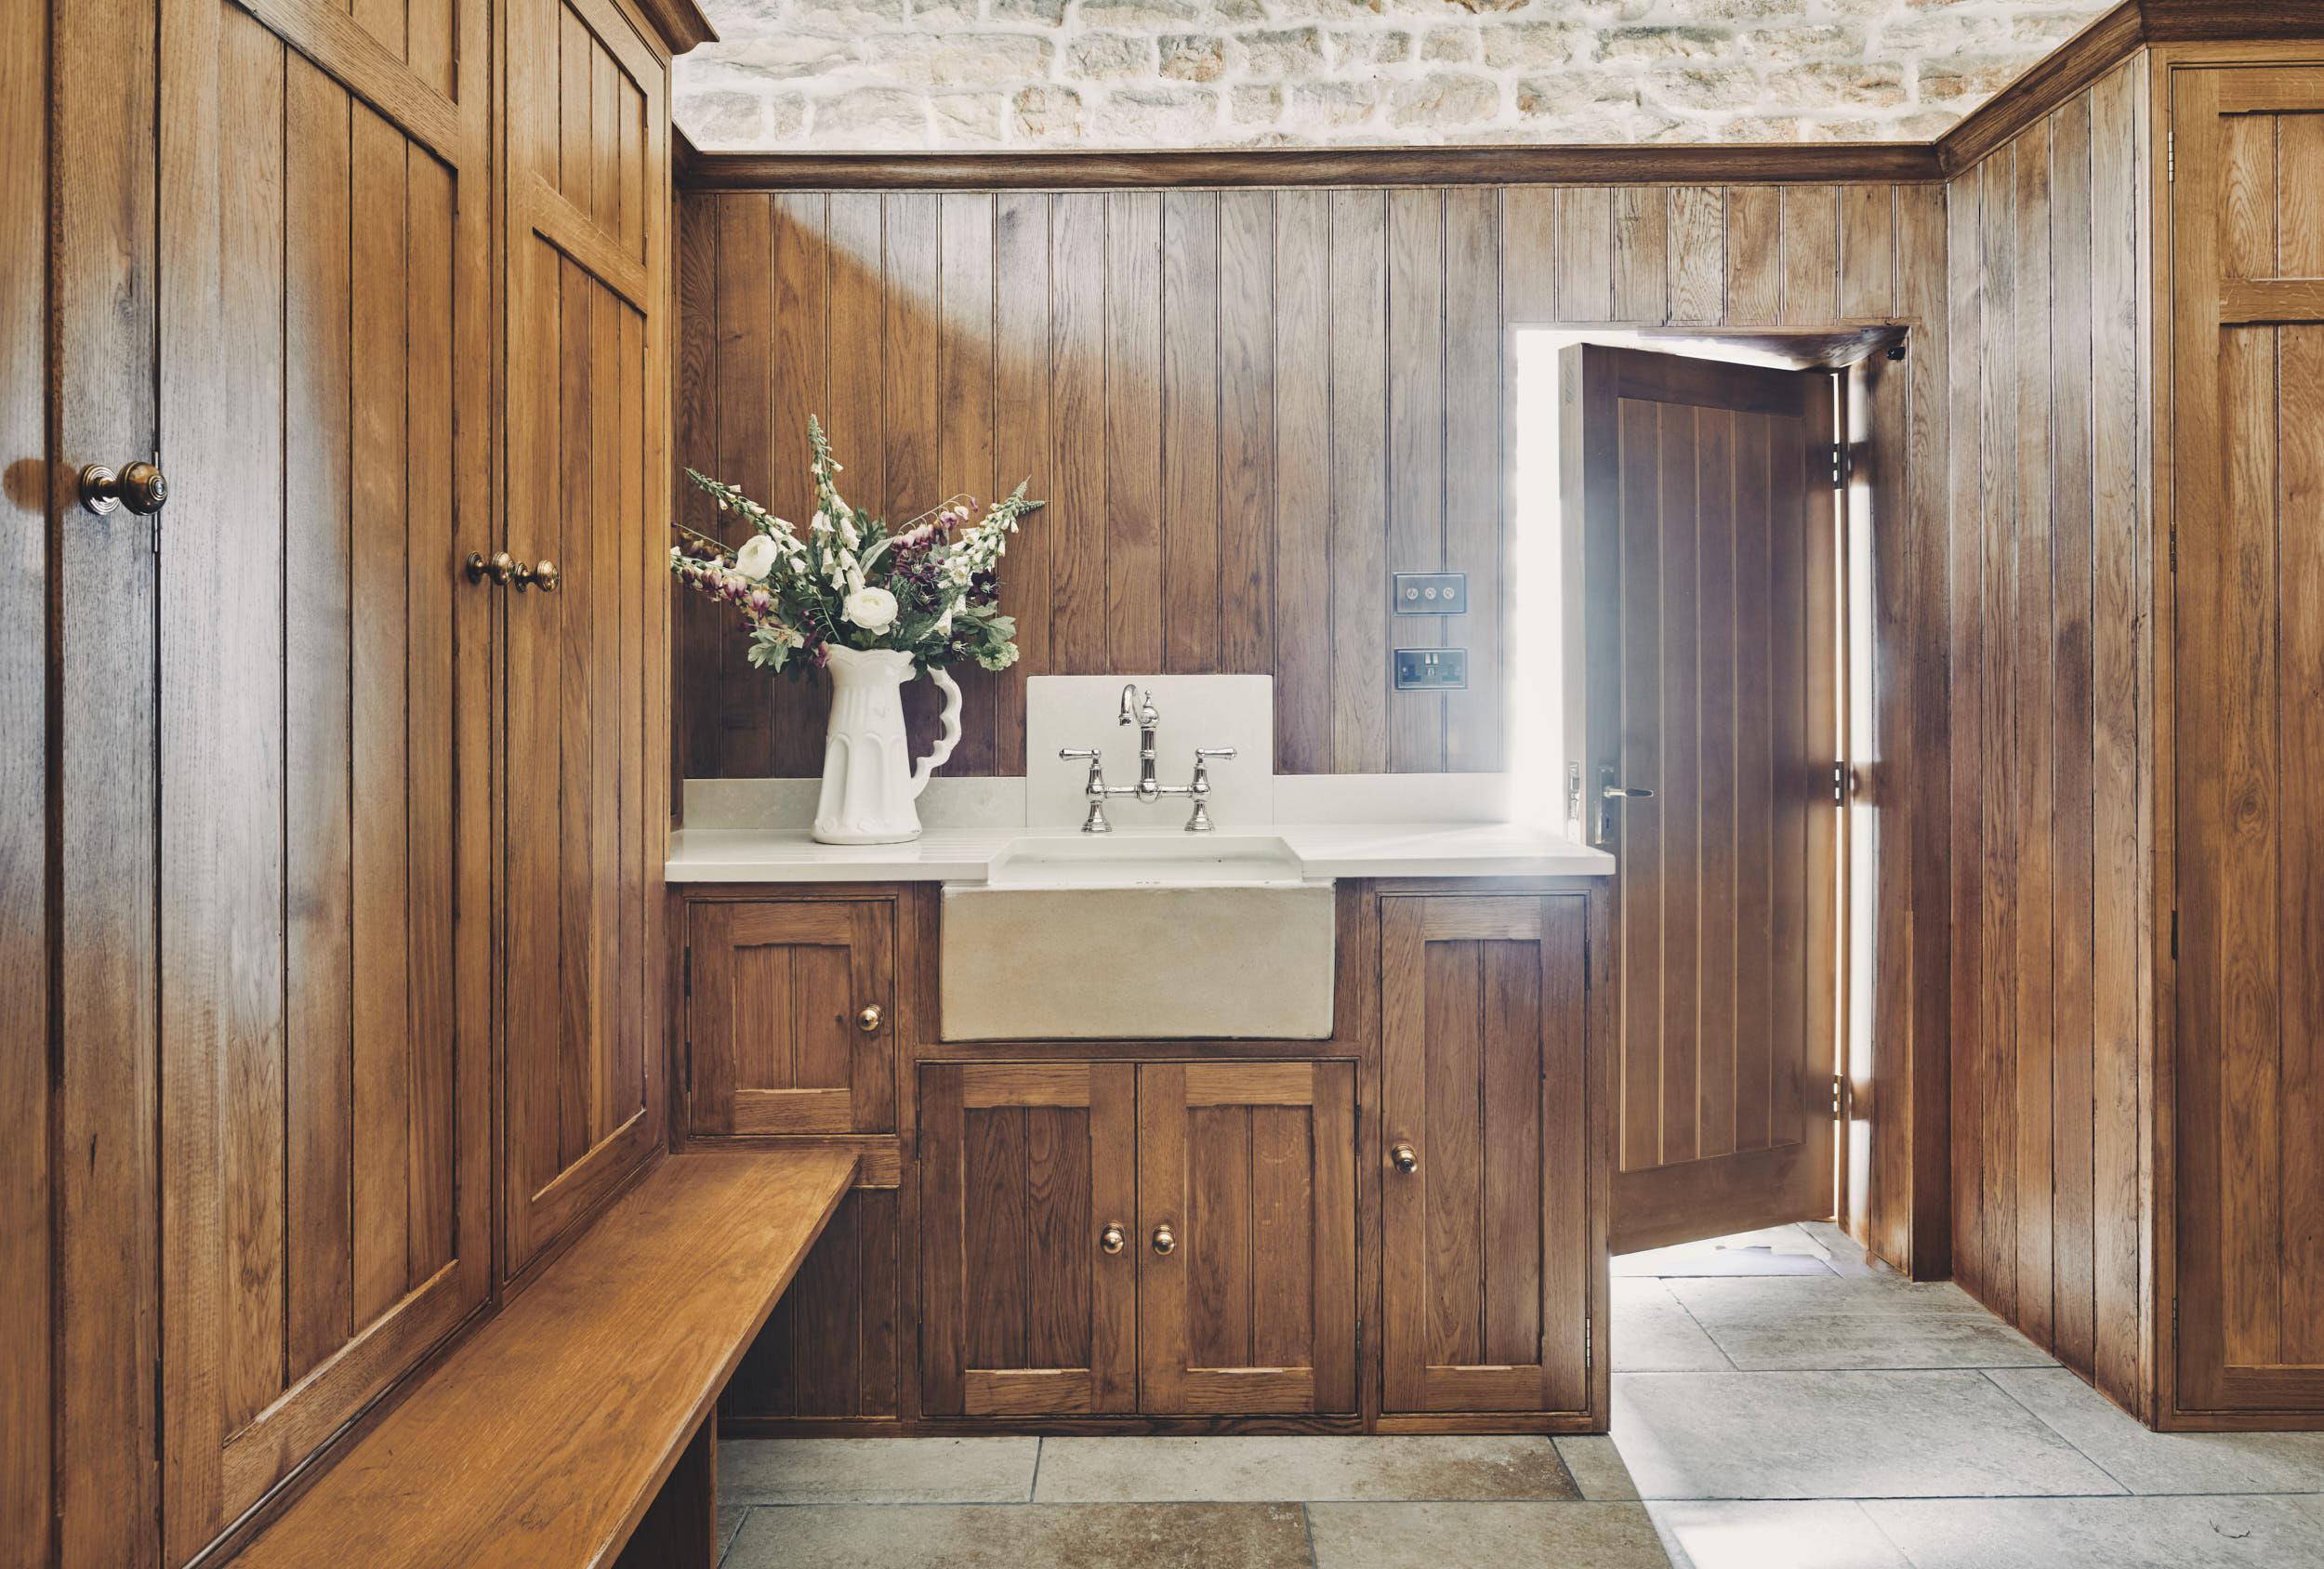 interior photography of luxury bespoke homes by matthew lloyd3178.jpg